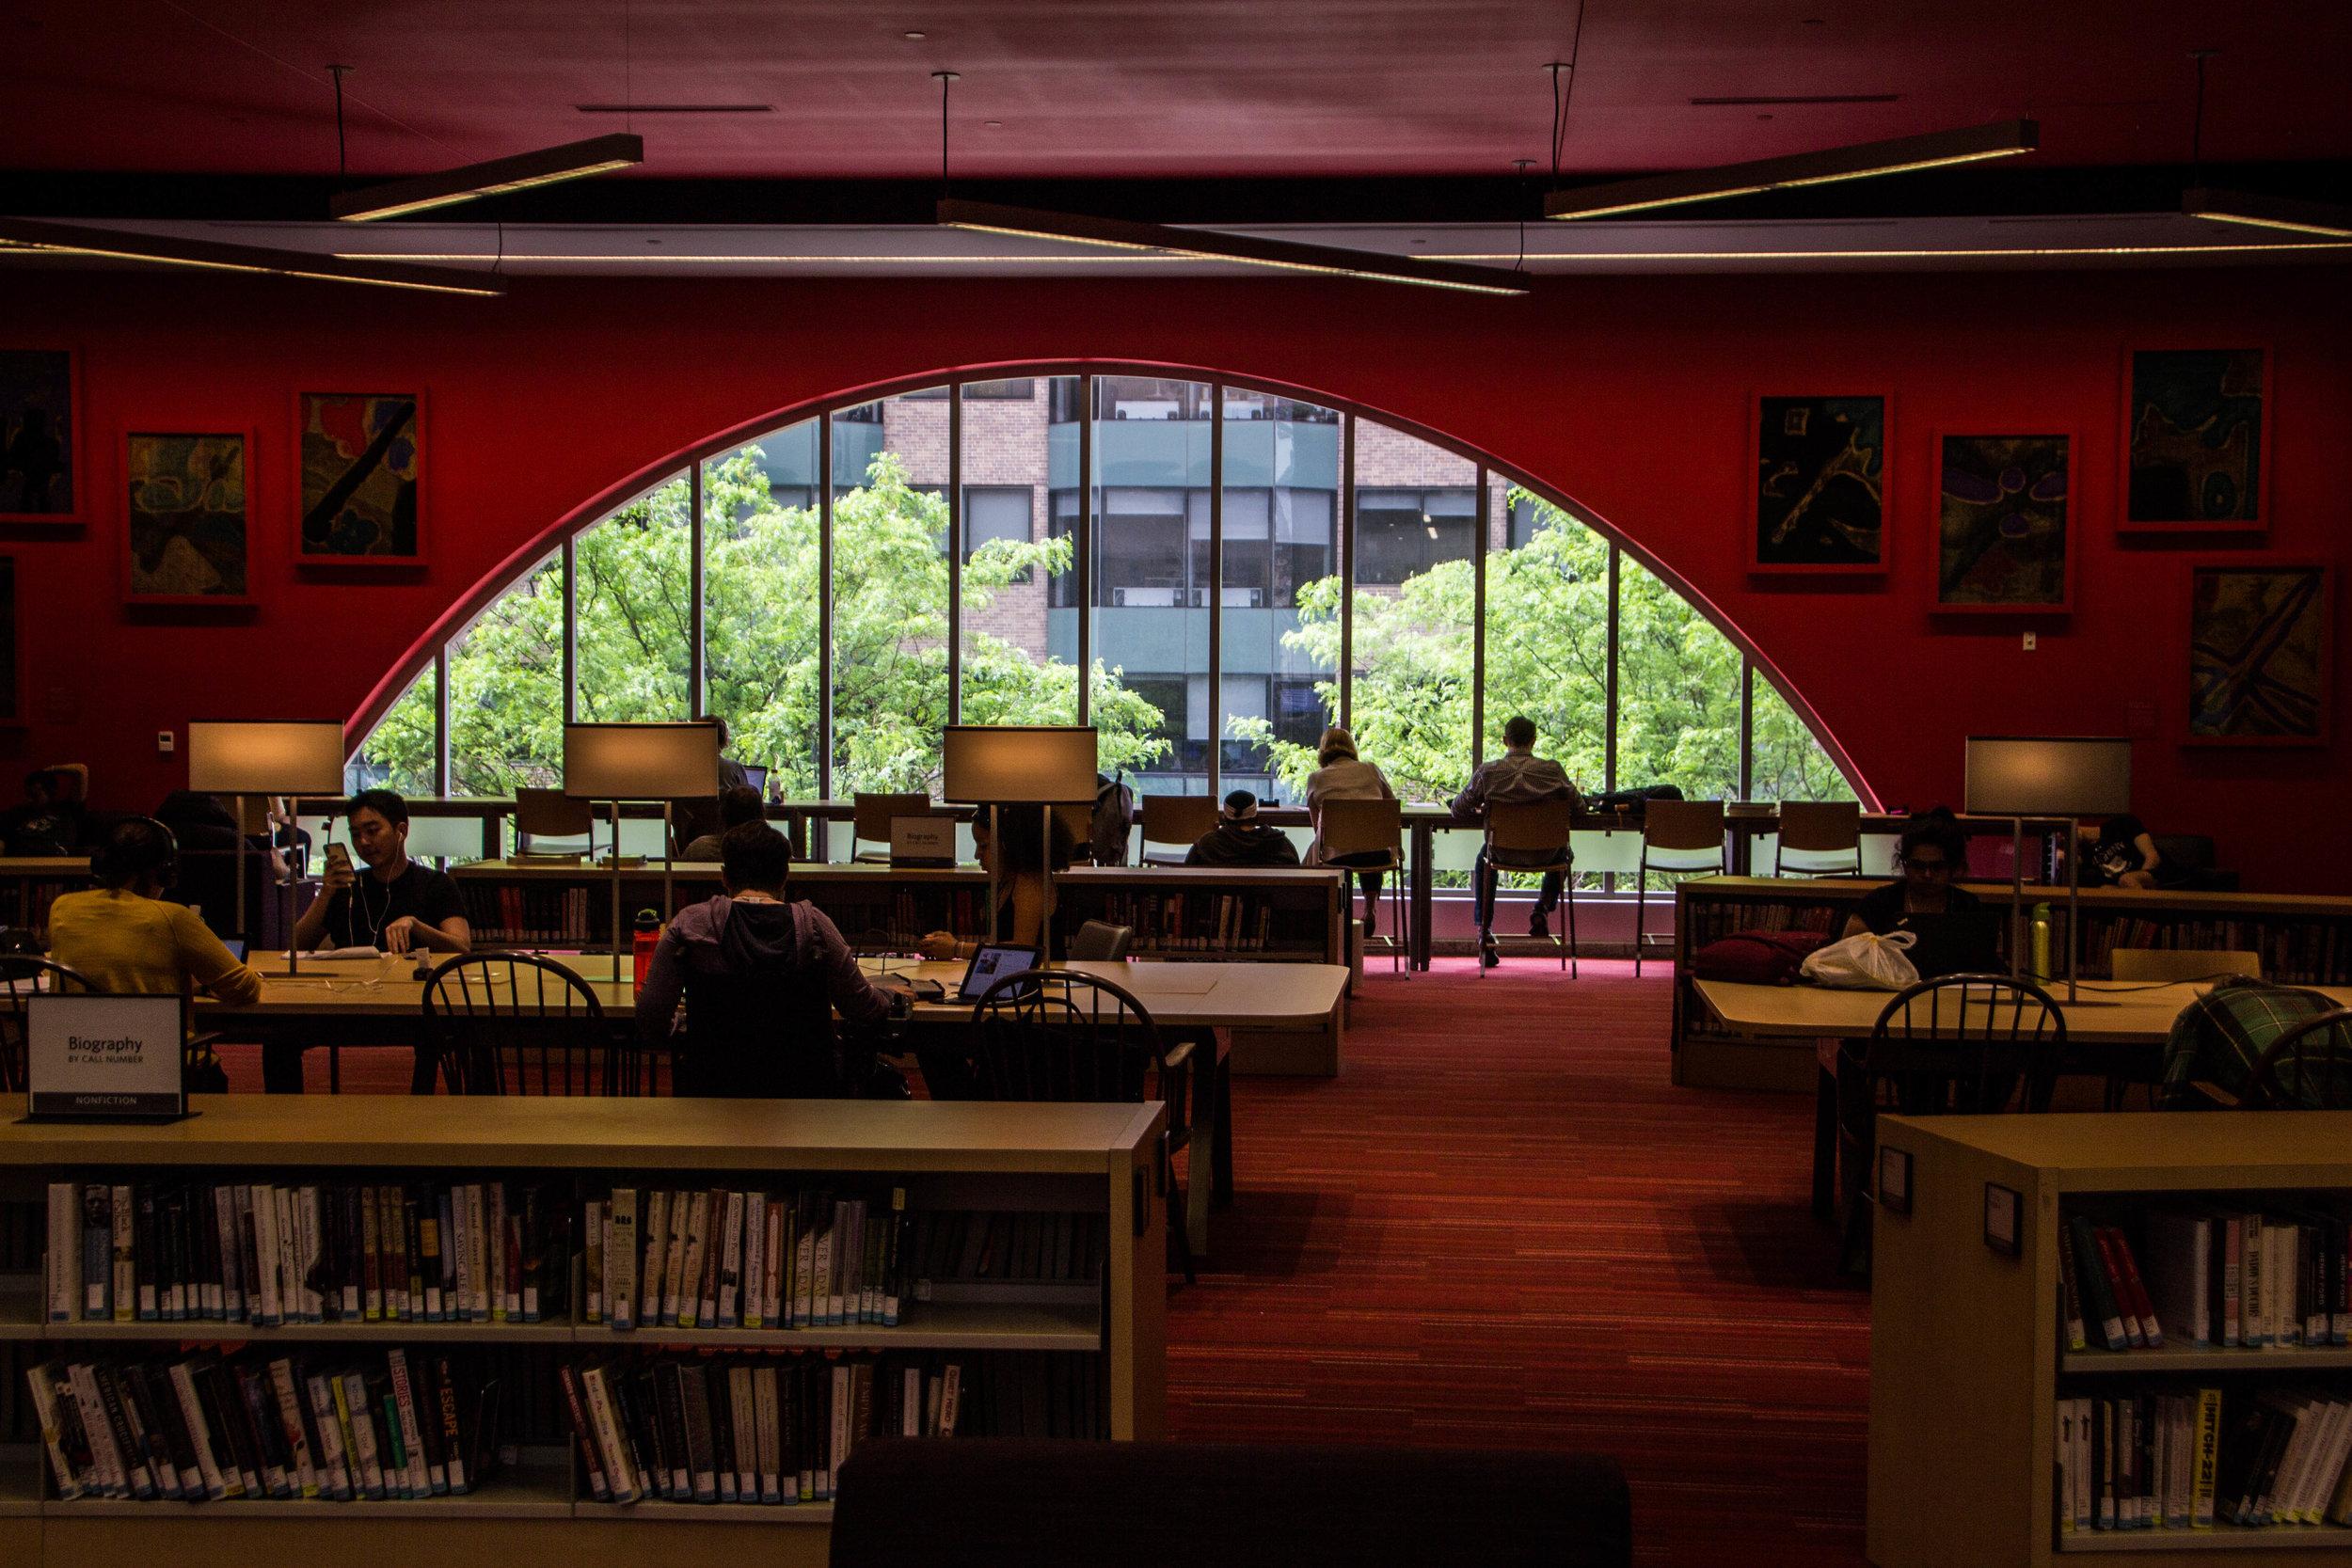 boston-public-library-photography-9.jpg